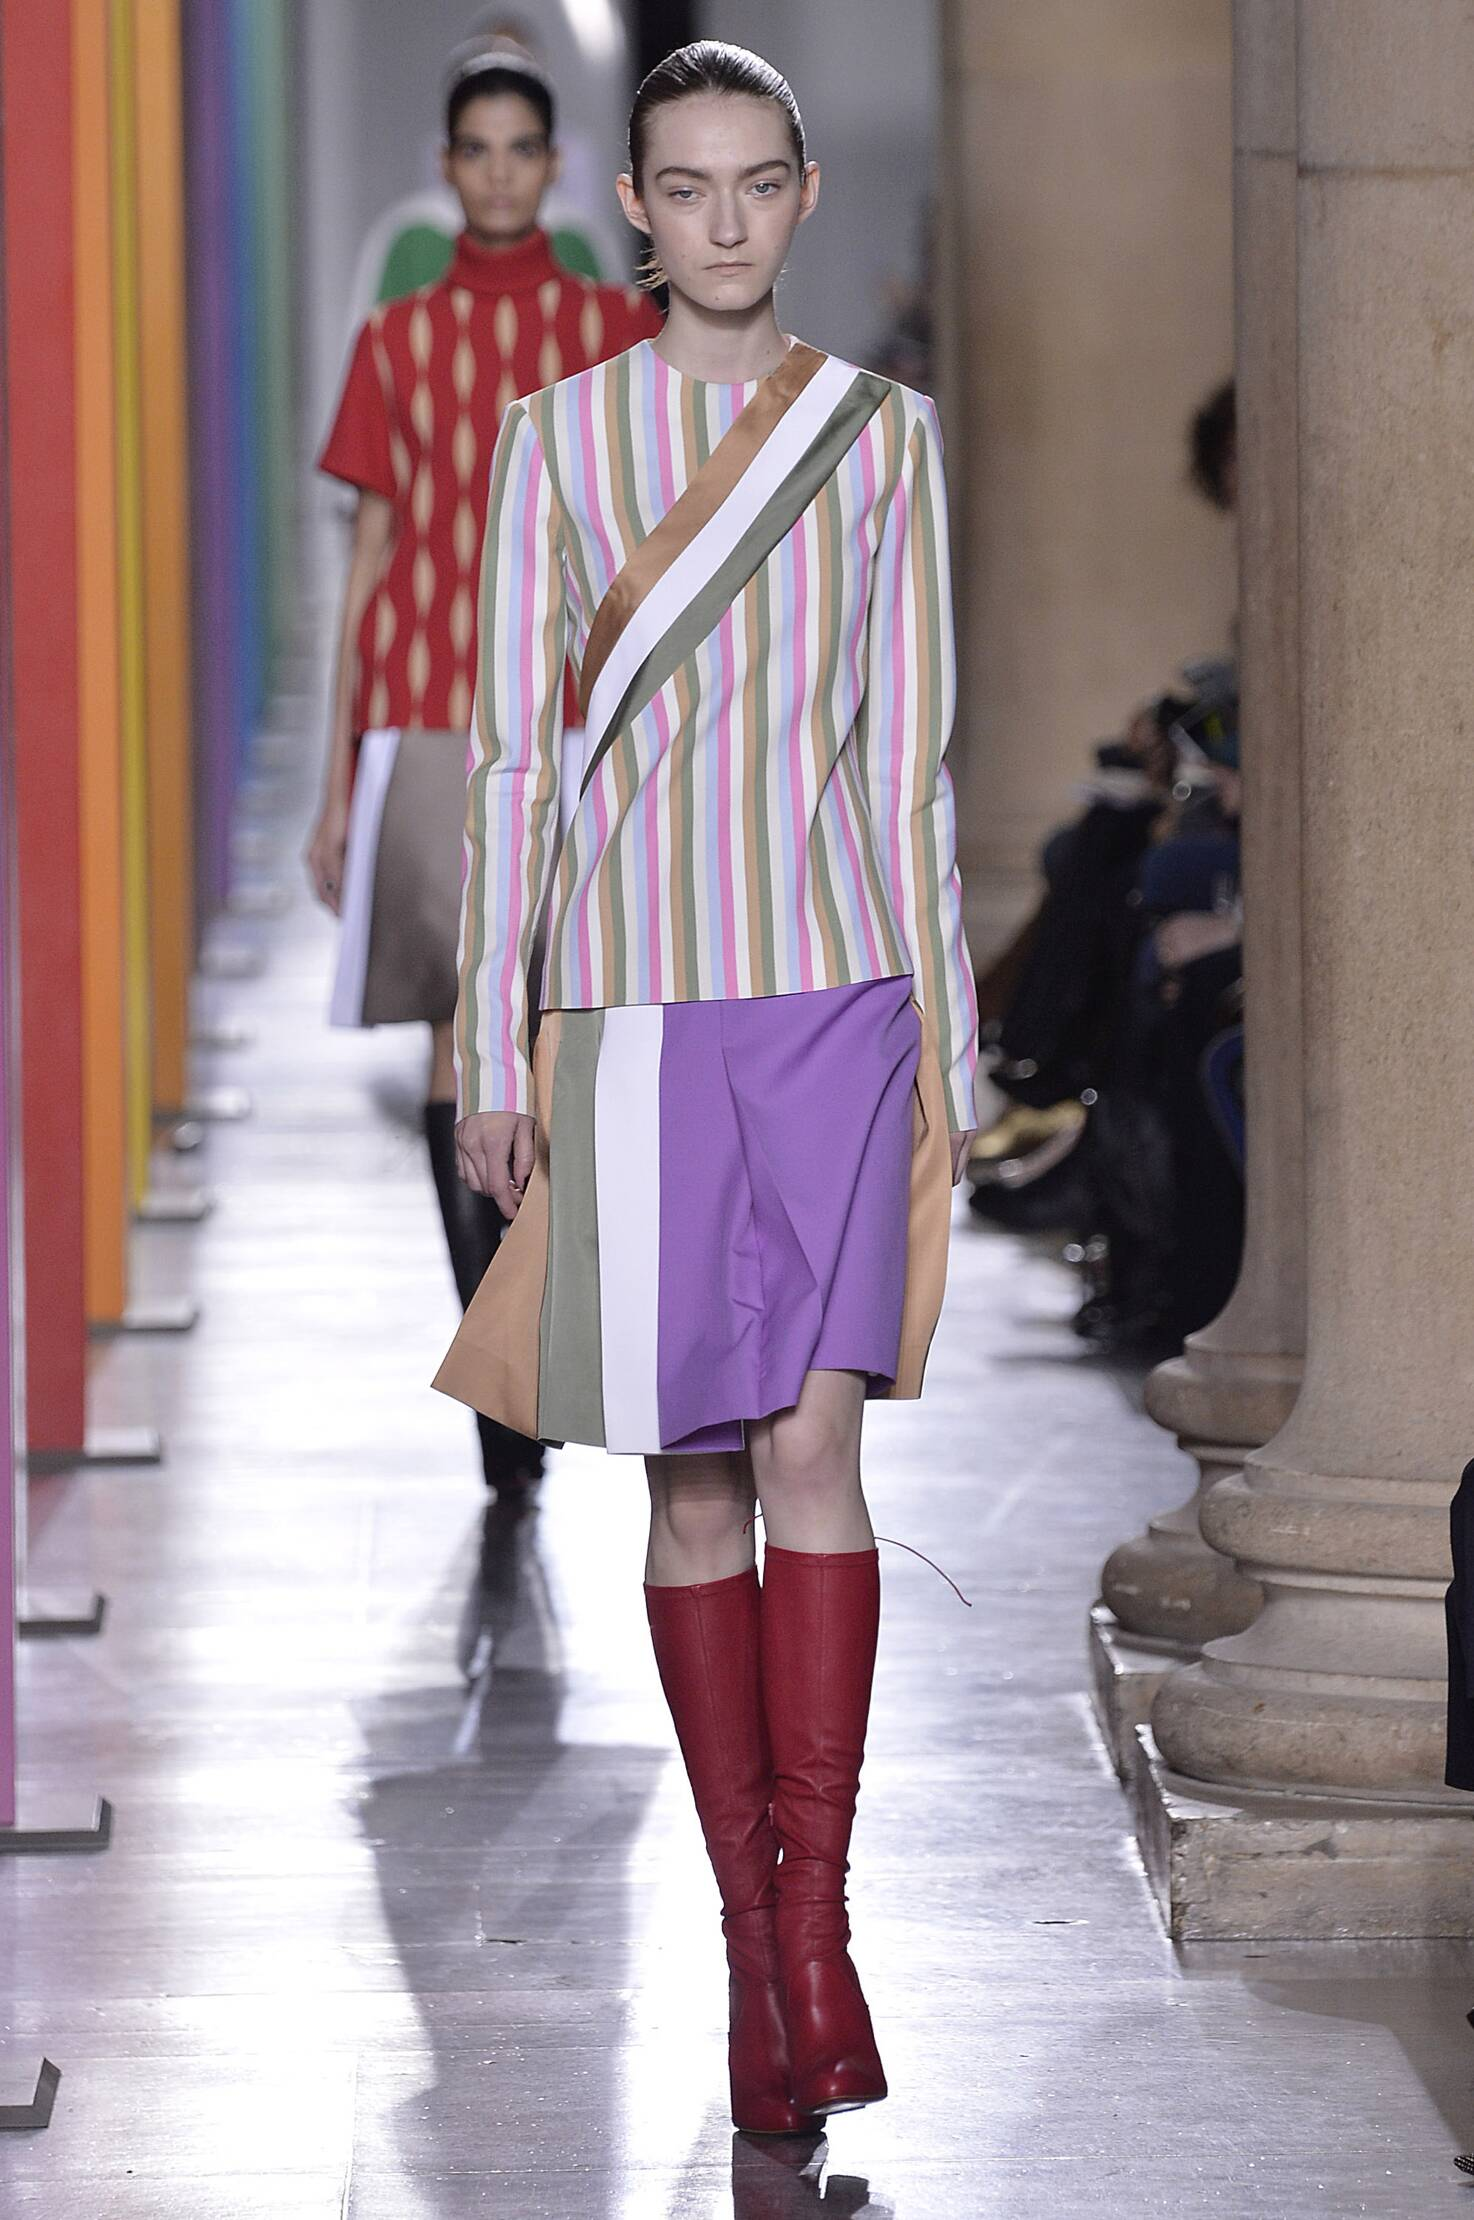 Jonathan Saunders Collection London Fashion Week Womenswear